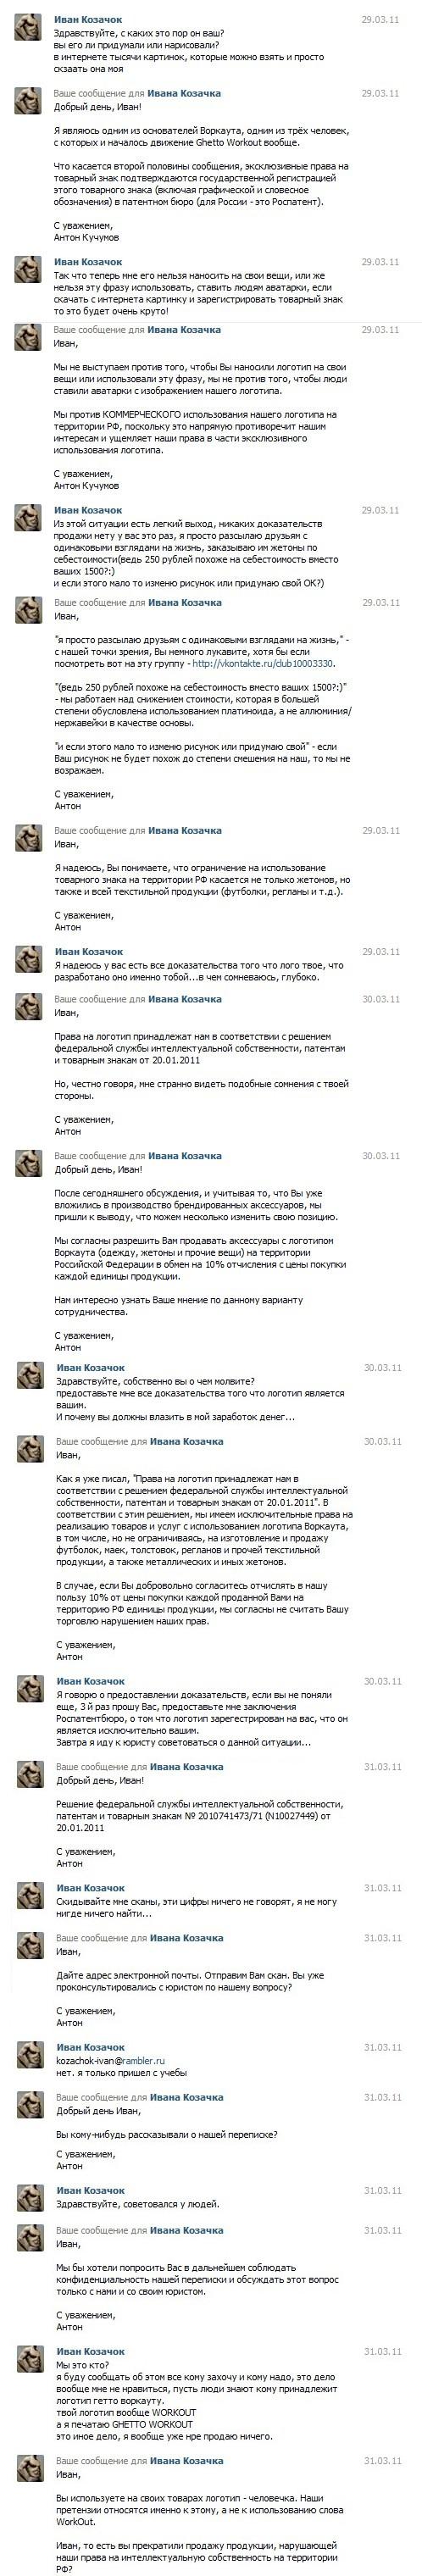 Вся правда о воркауте (Часть II: Об Иване Козачке)